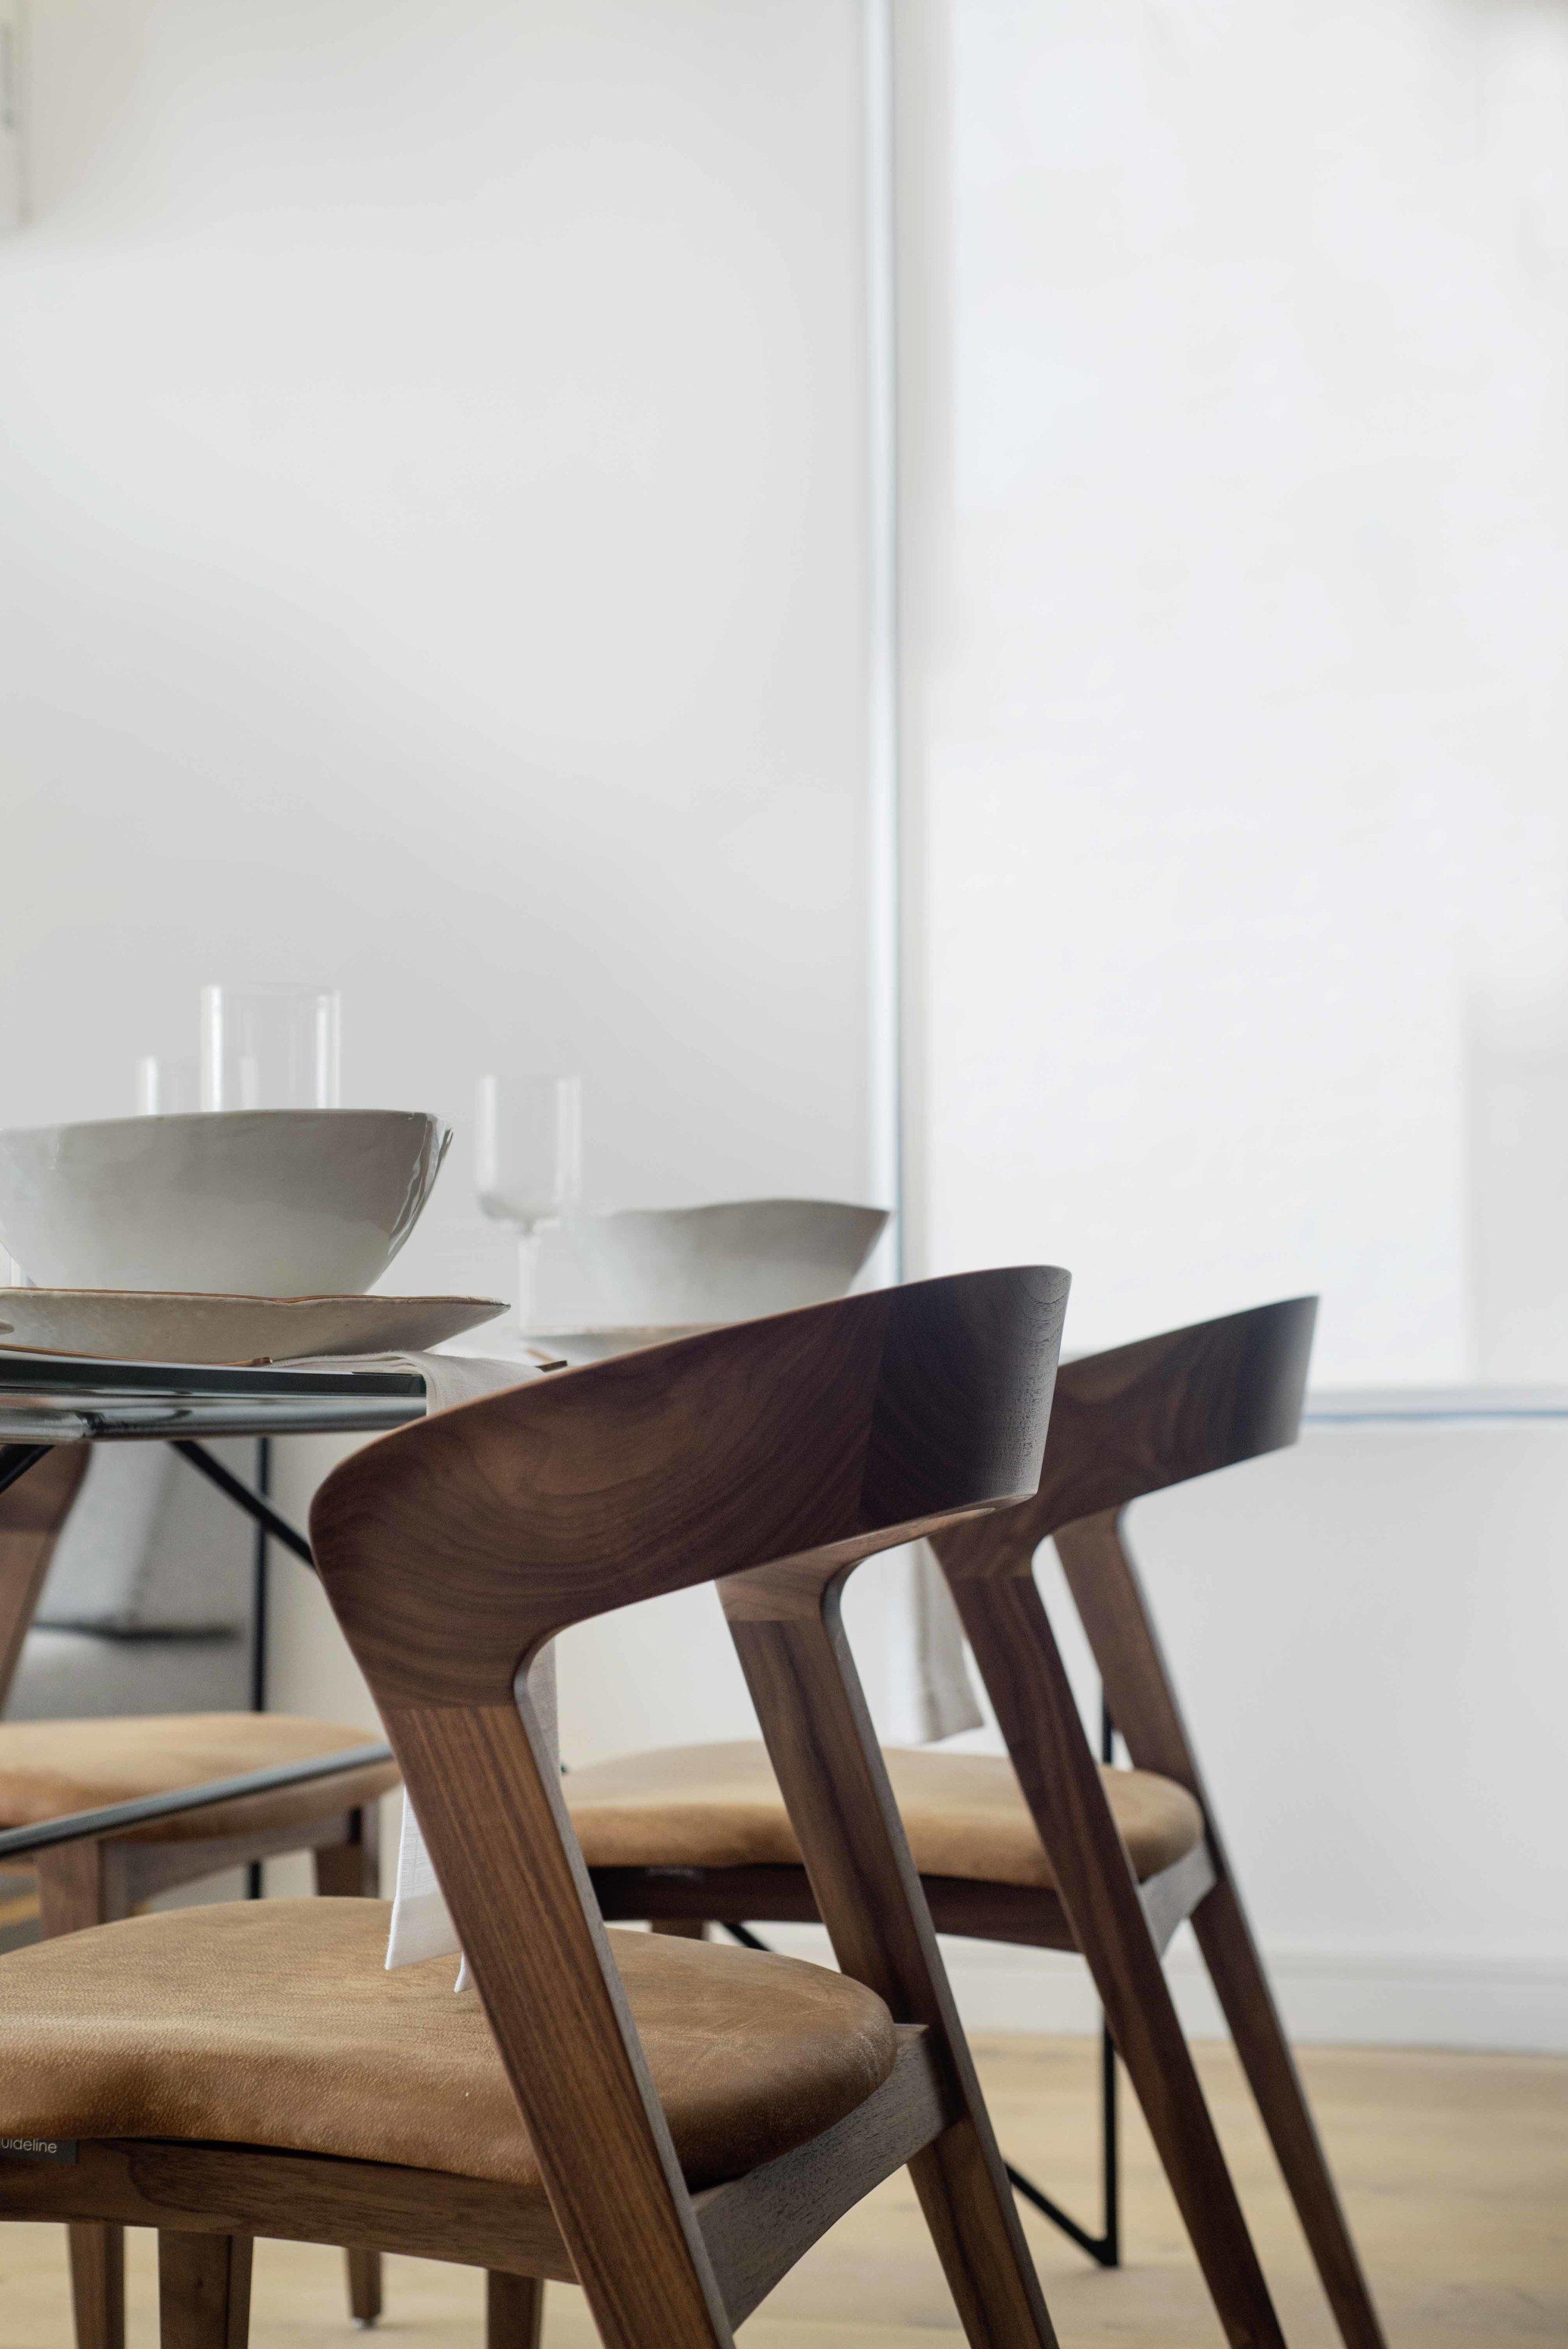 Wallnut Tulip chairs